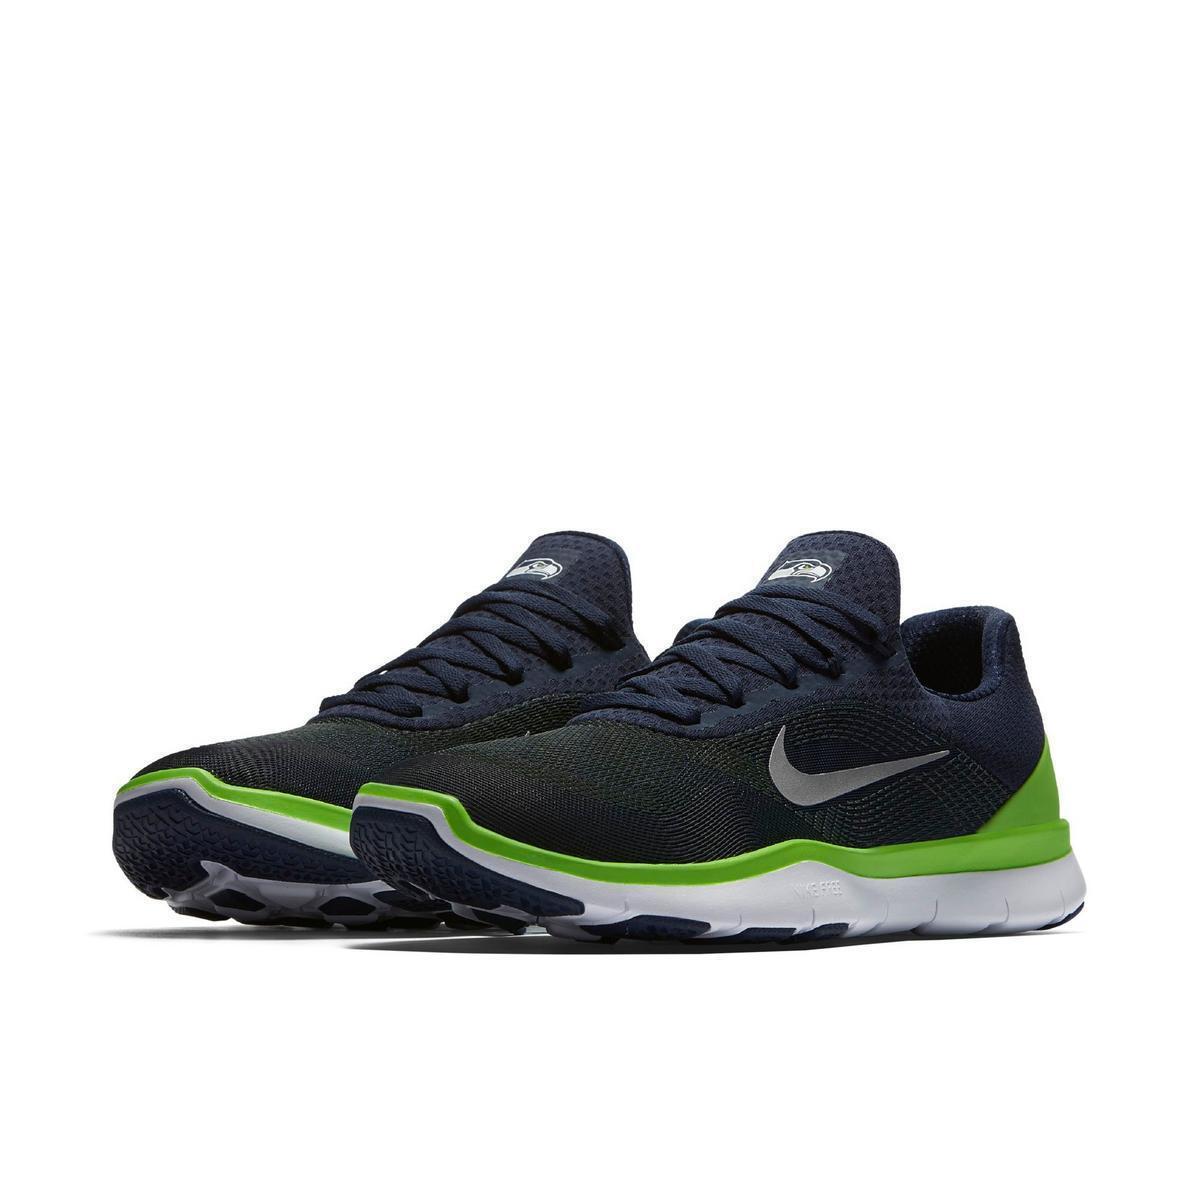 Nike Free Trainer V7 Seattle Seahawks NFL Training Running shoes New W  Box